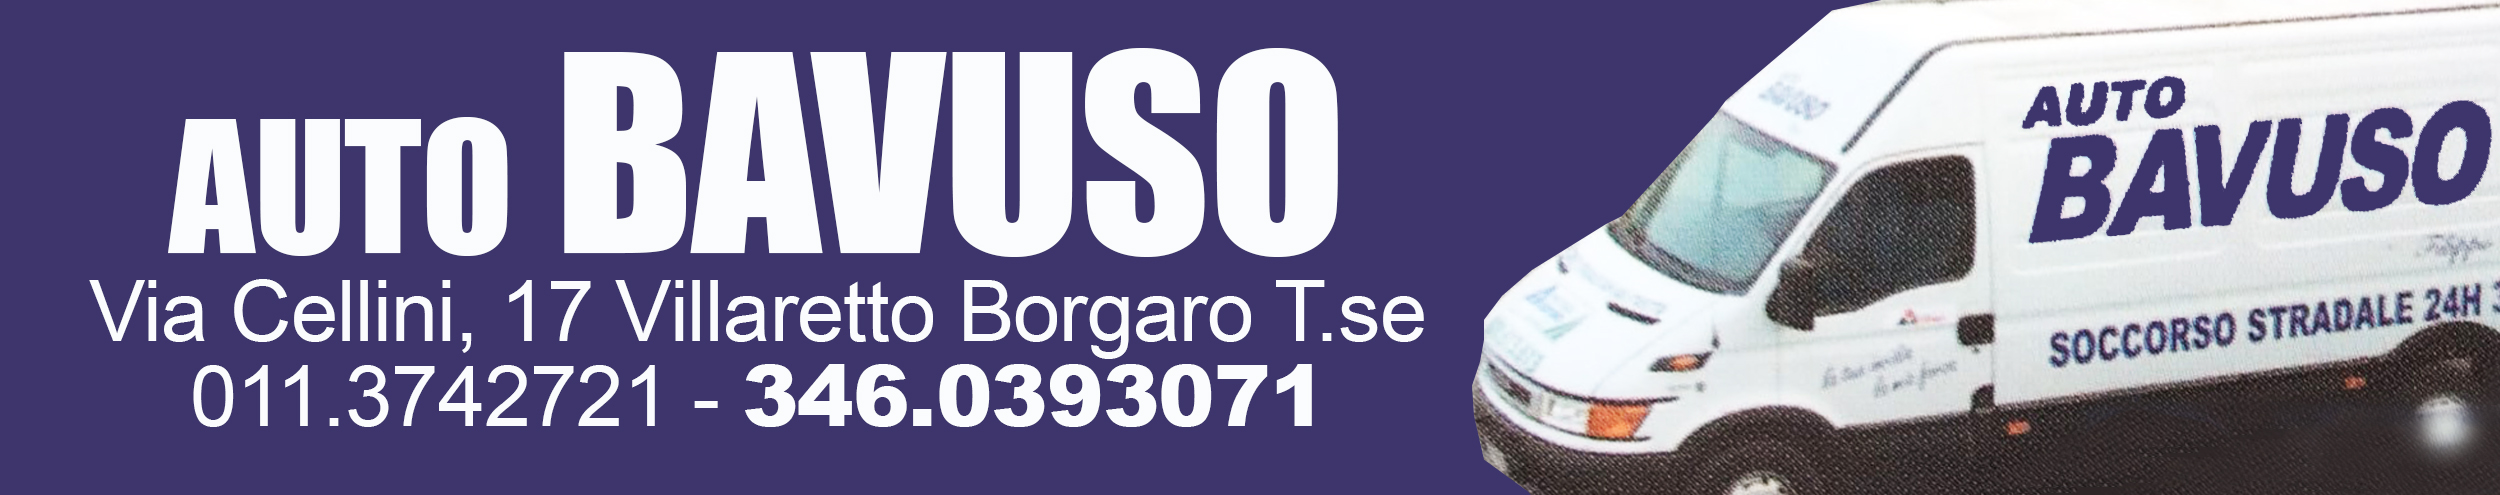 bavuso